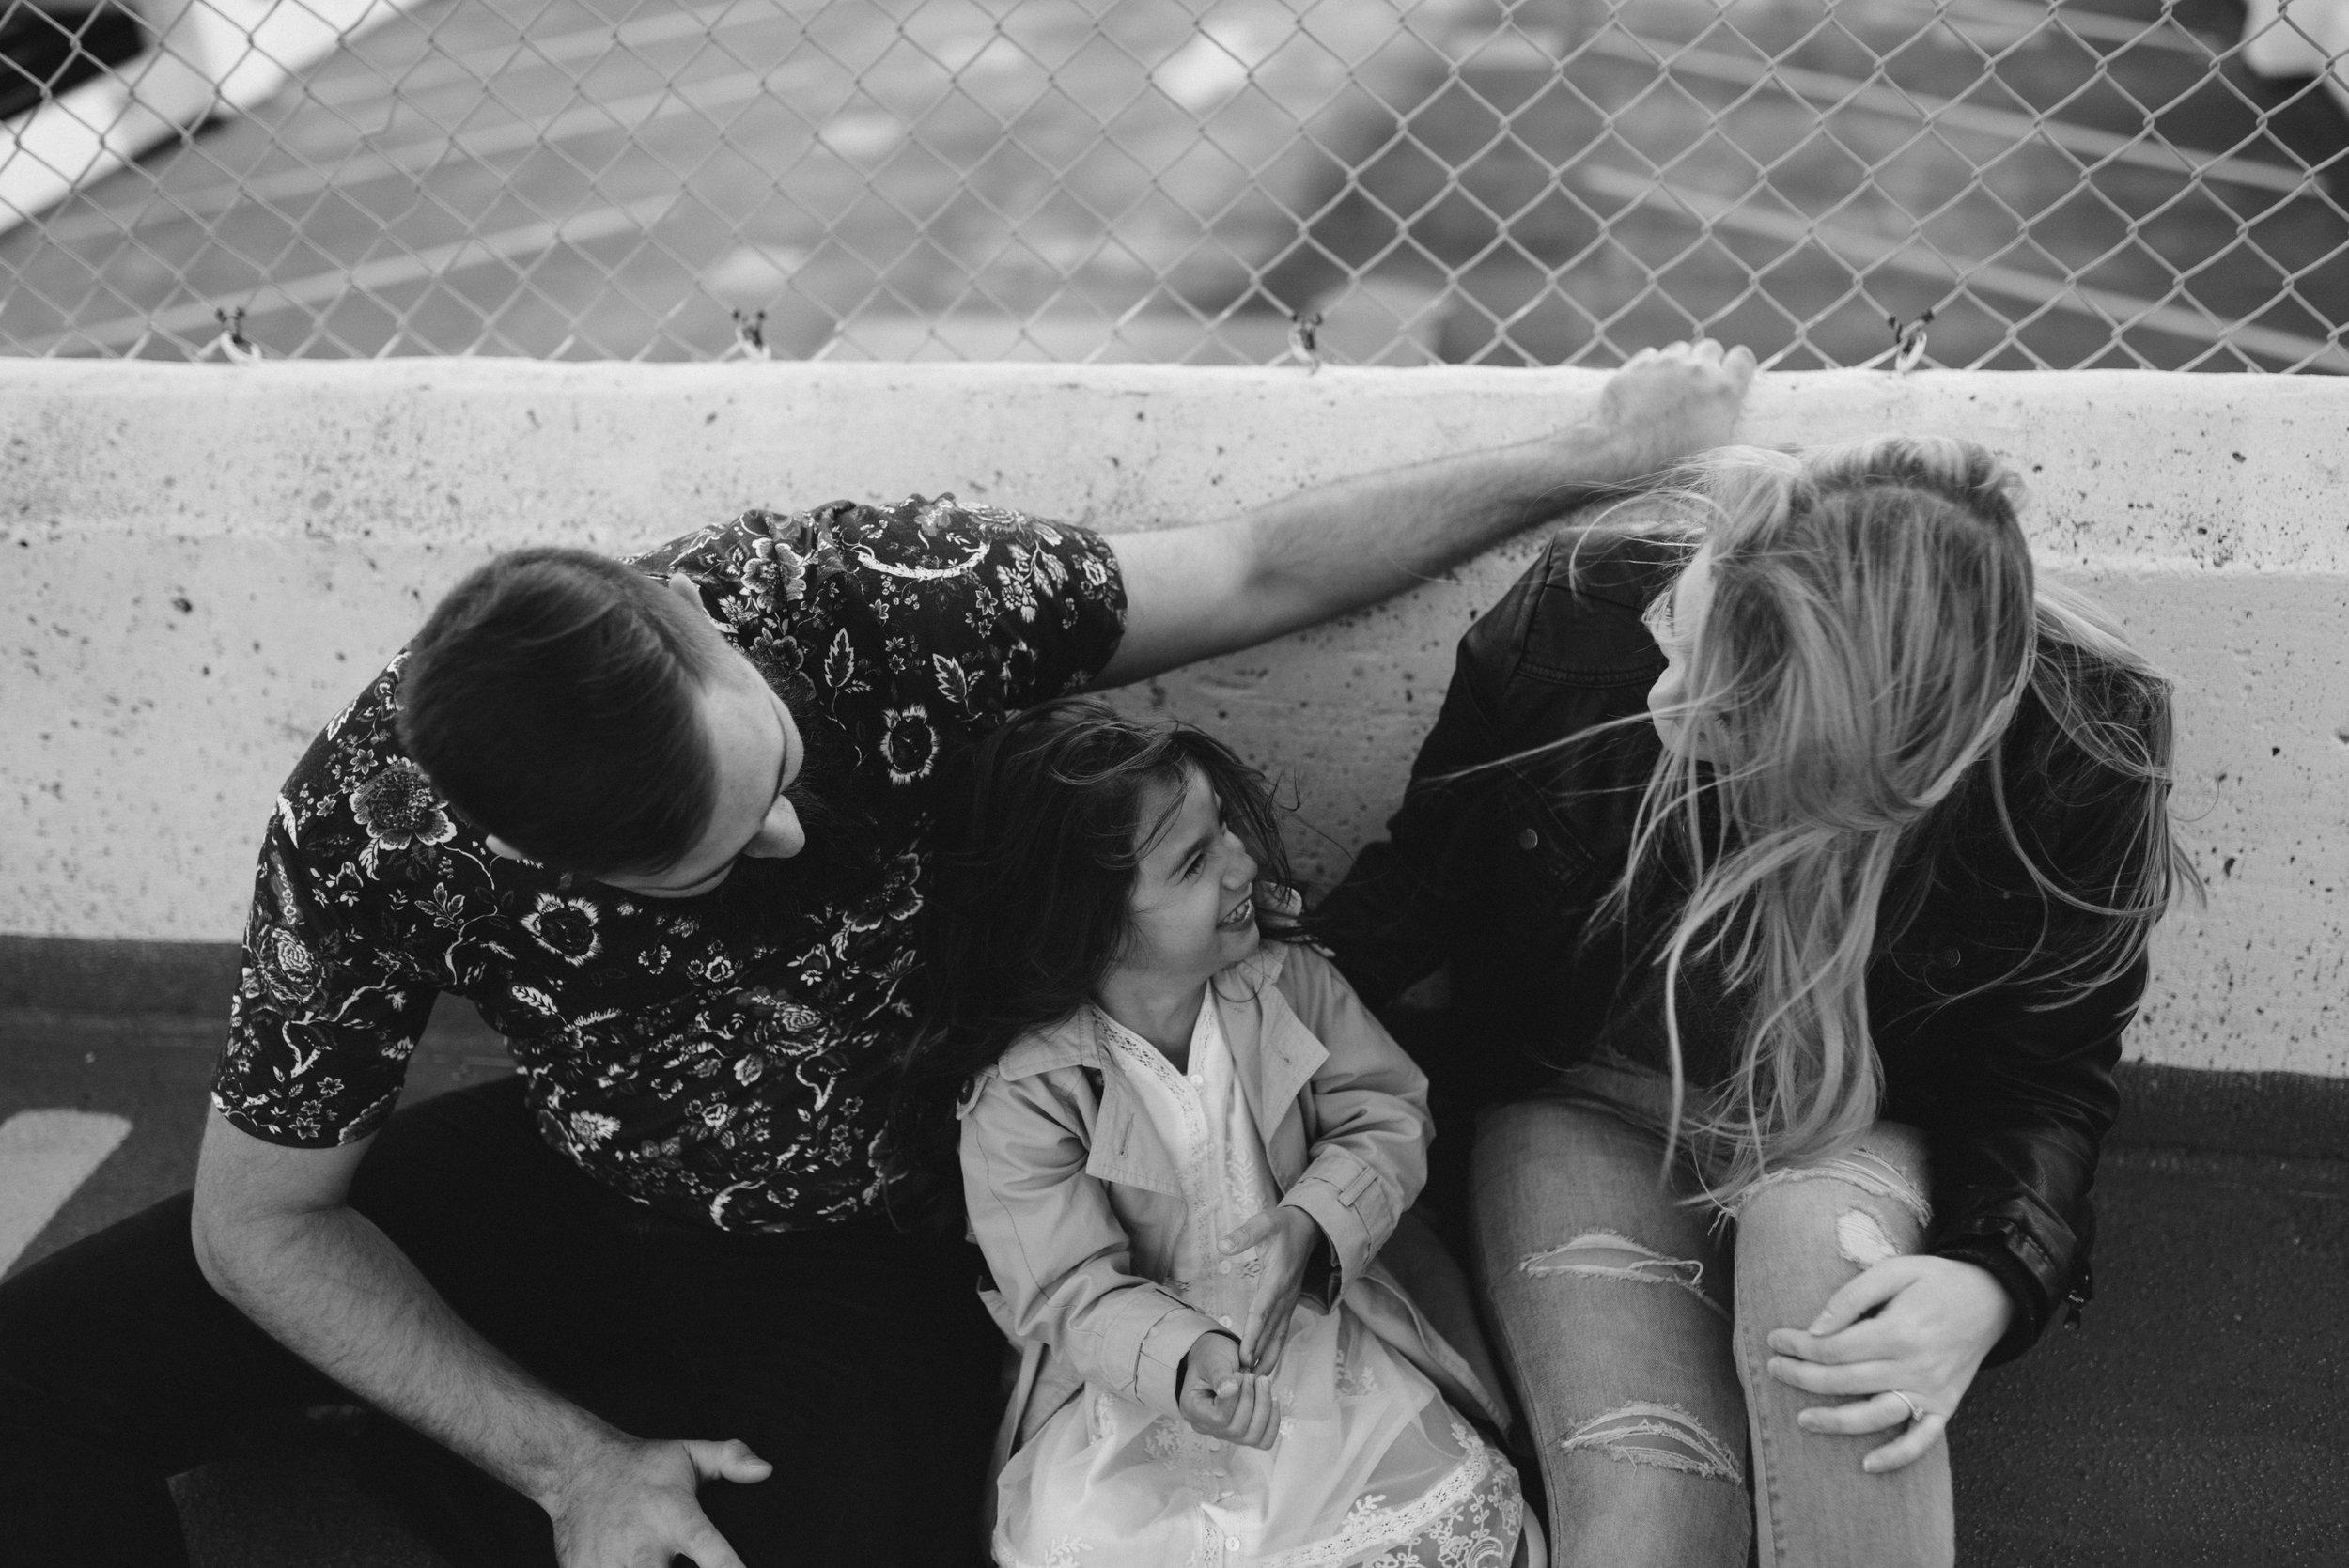 jessica-leanne-photography-st-albert-canada-1974-2.jpg